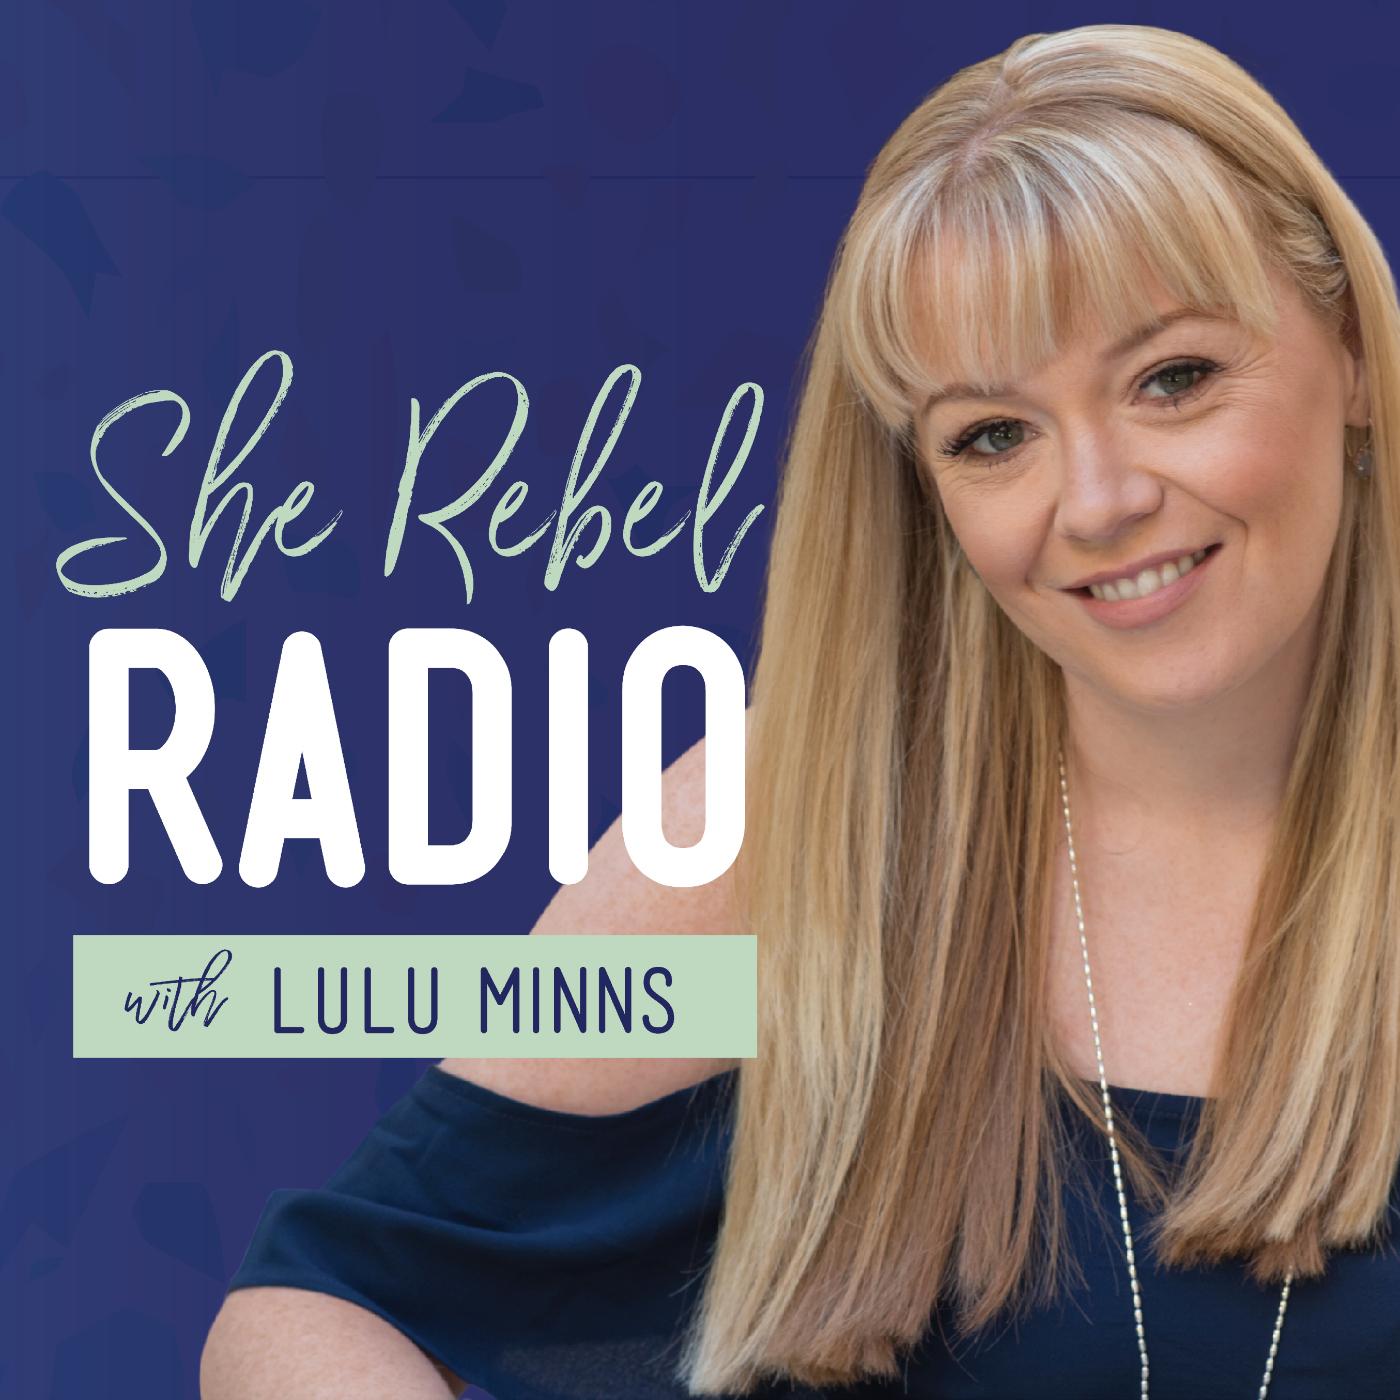 She Rebel Radio show art